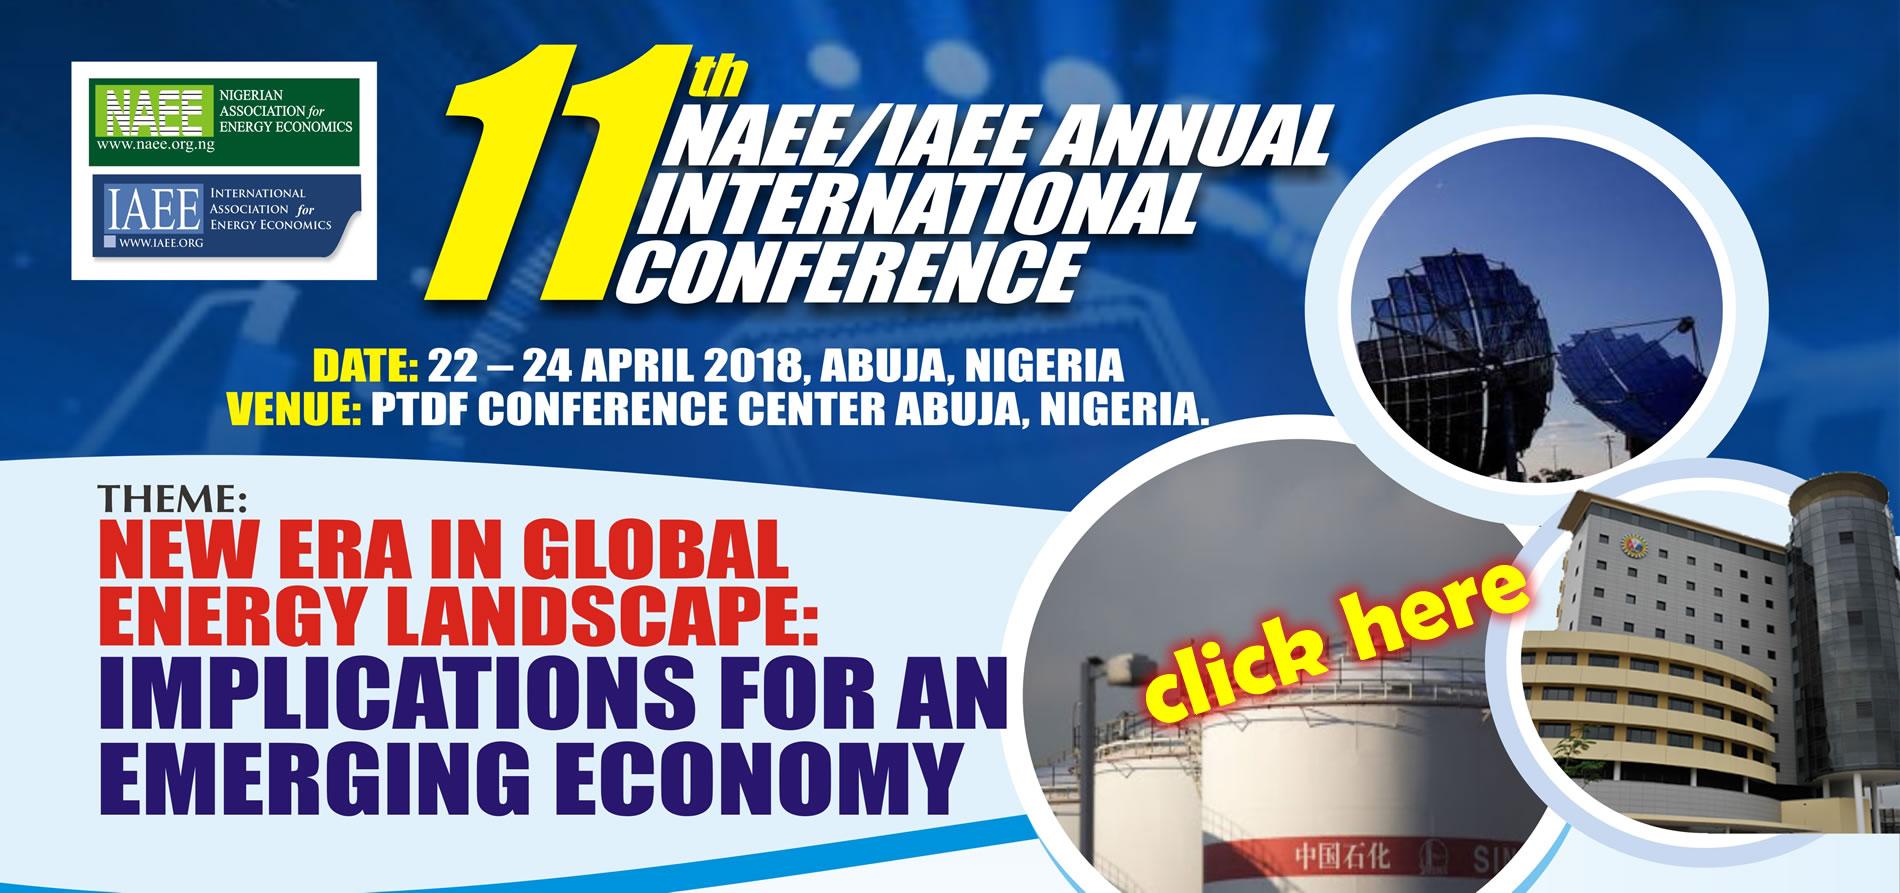 2018 NAEE/IAEE Conference